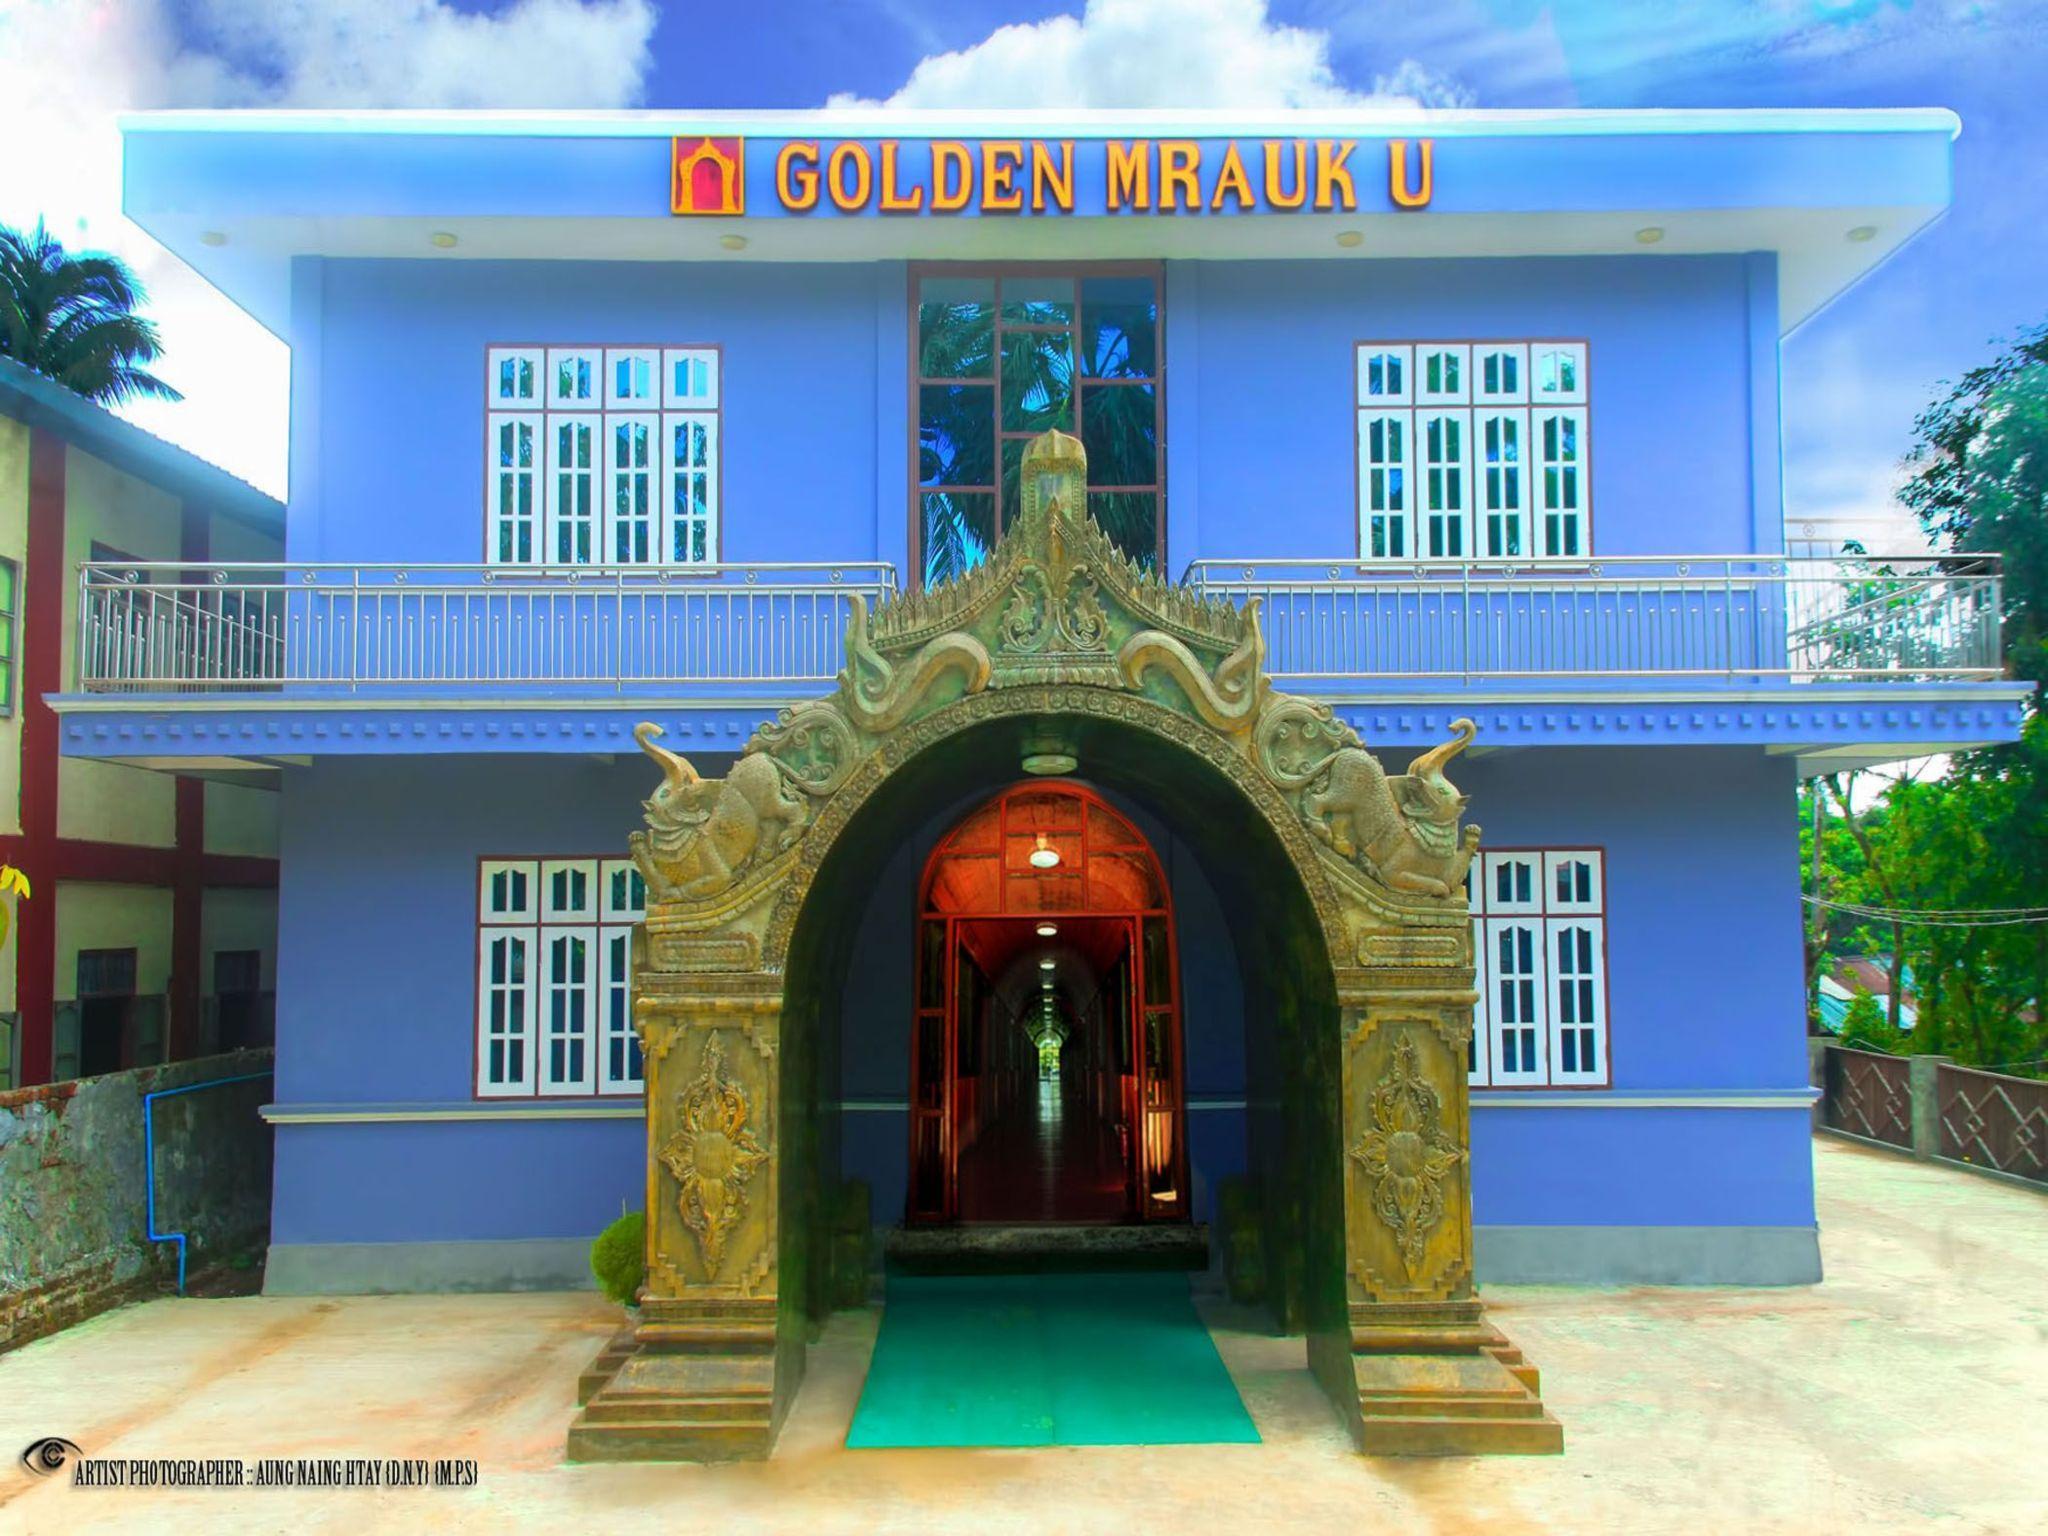 Golden Mrauk U Guest House, Sittwe